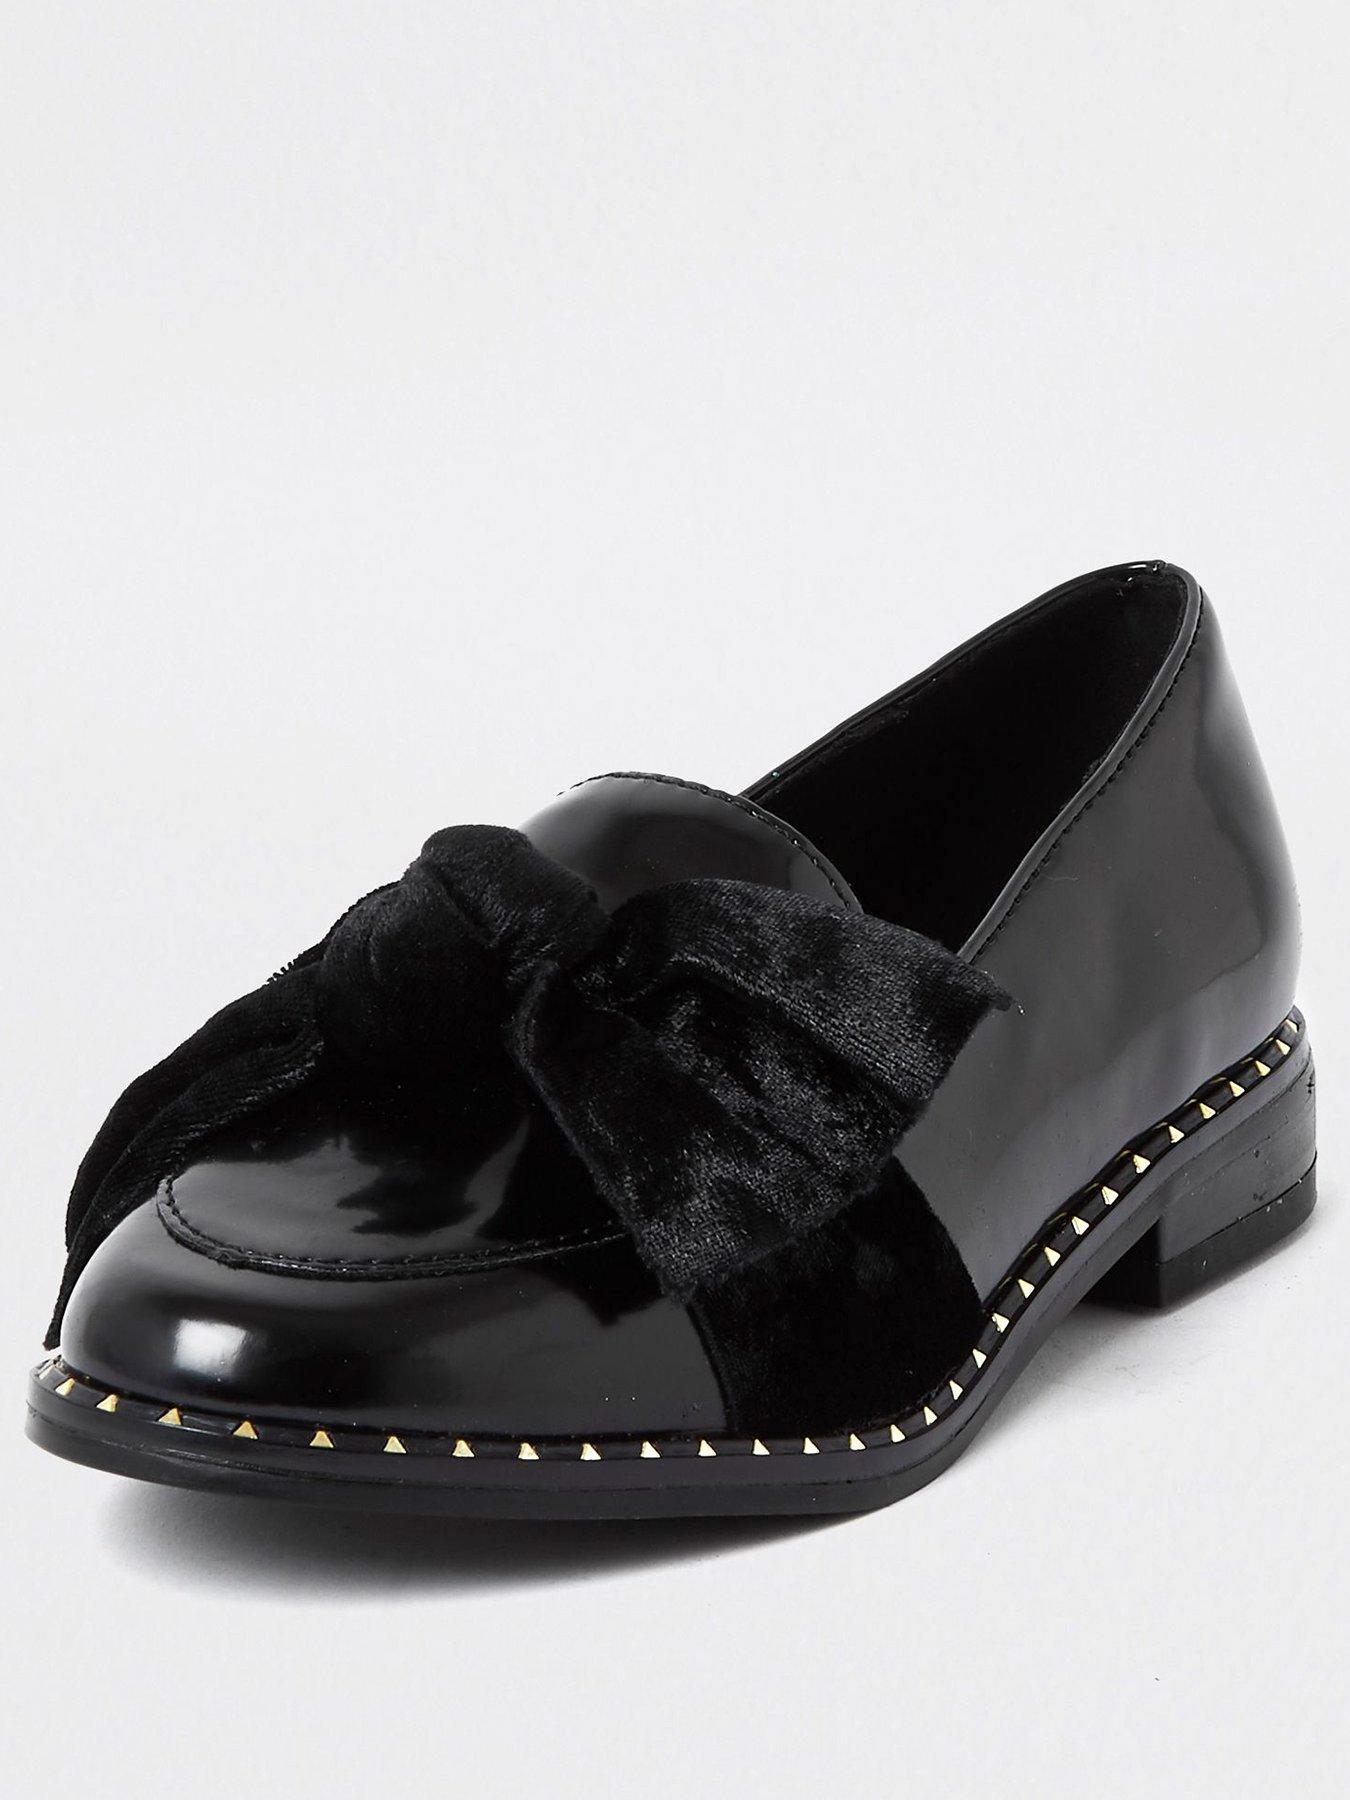 4 | River island | Shoes \u0026 boots